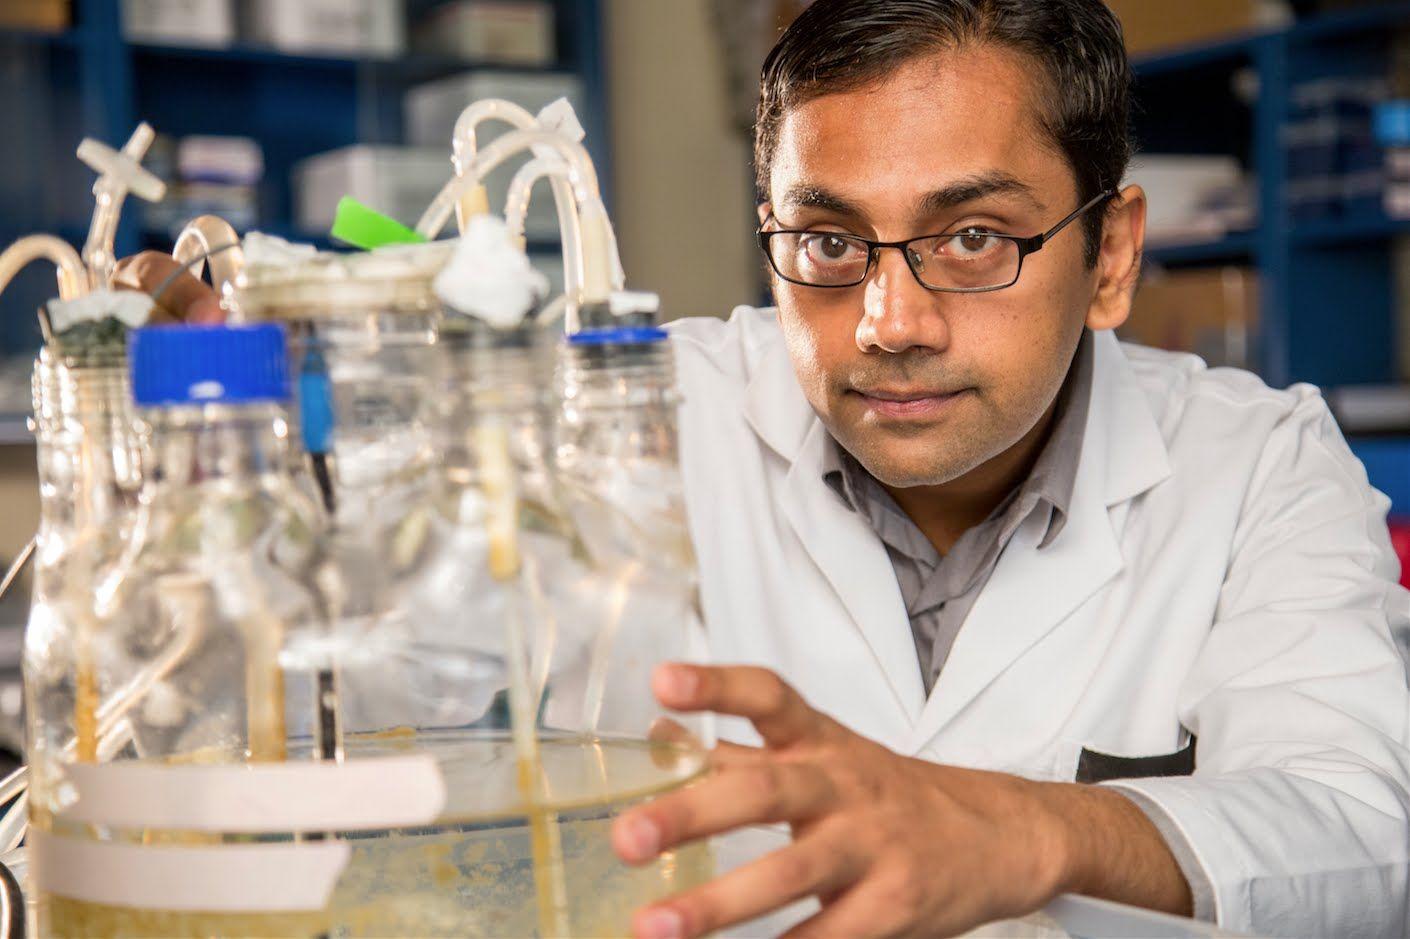 Environmental Engineer Kartik Chandran, 2015 MacArthur Fellow